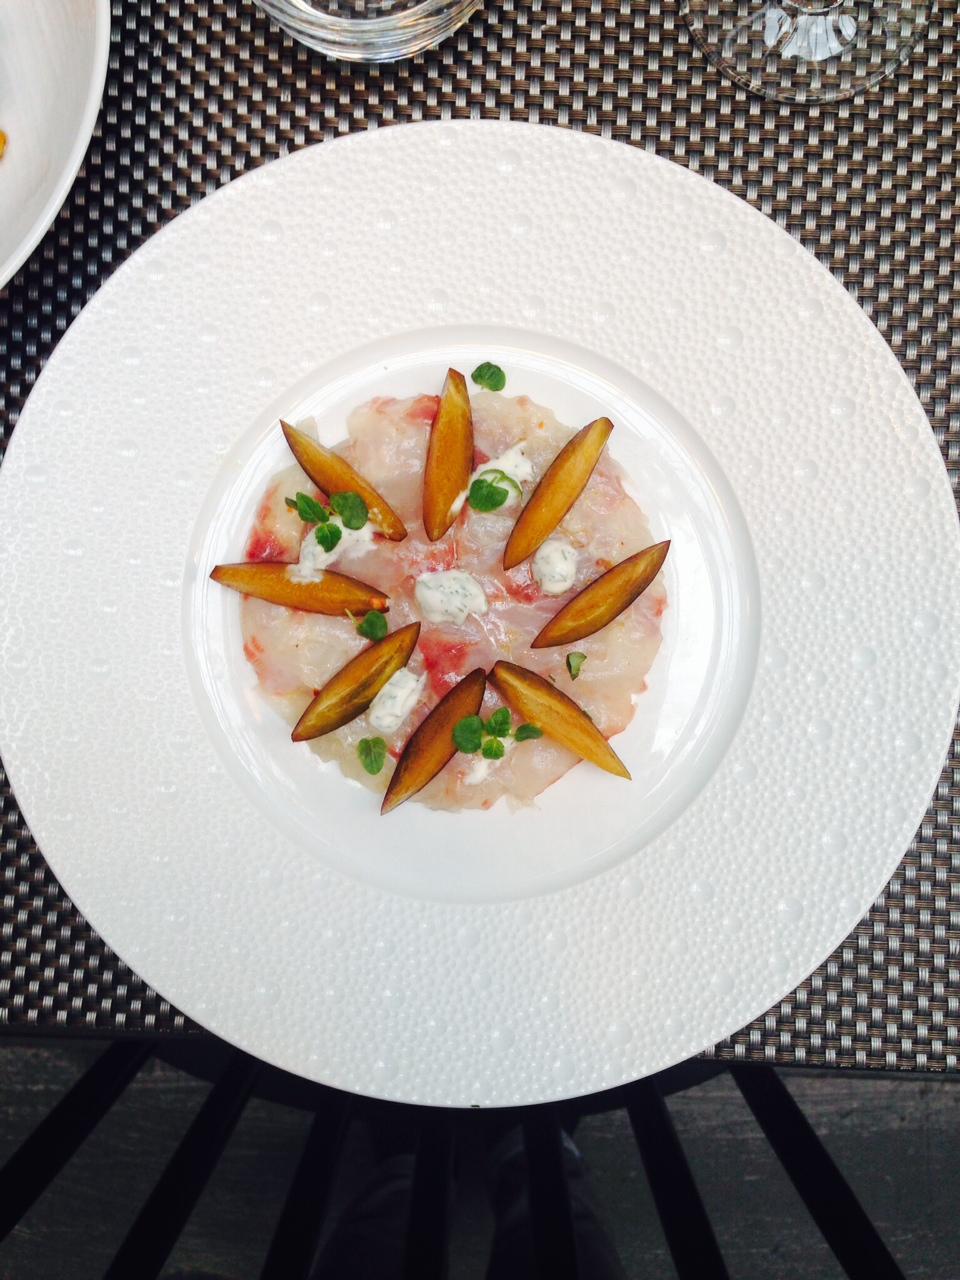 Carpaccio de dorade aux agrumes et p che blanche cr me - Cuisine attitude lignac ...